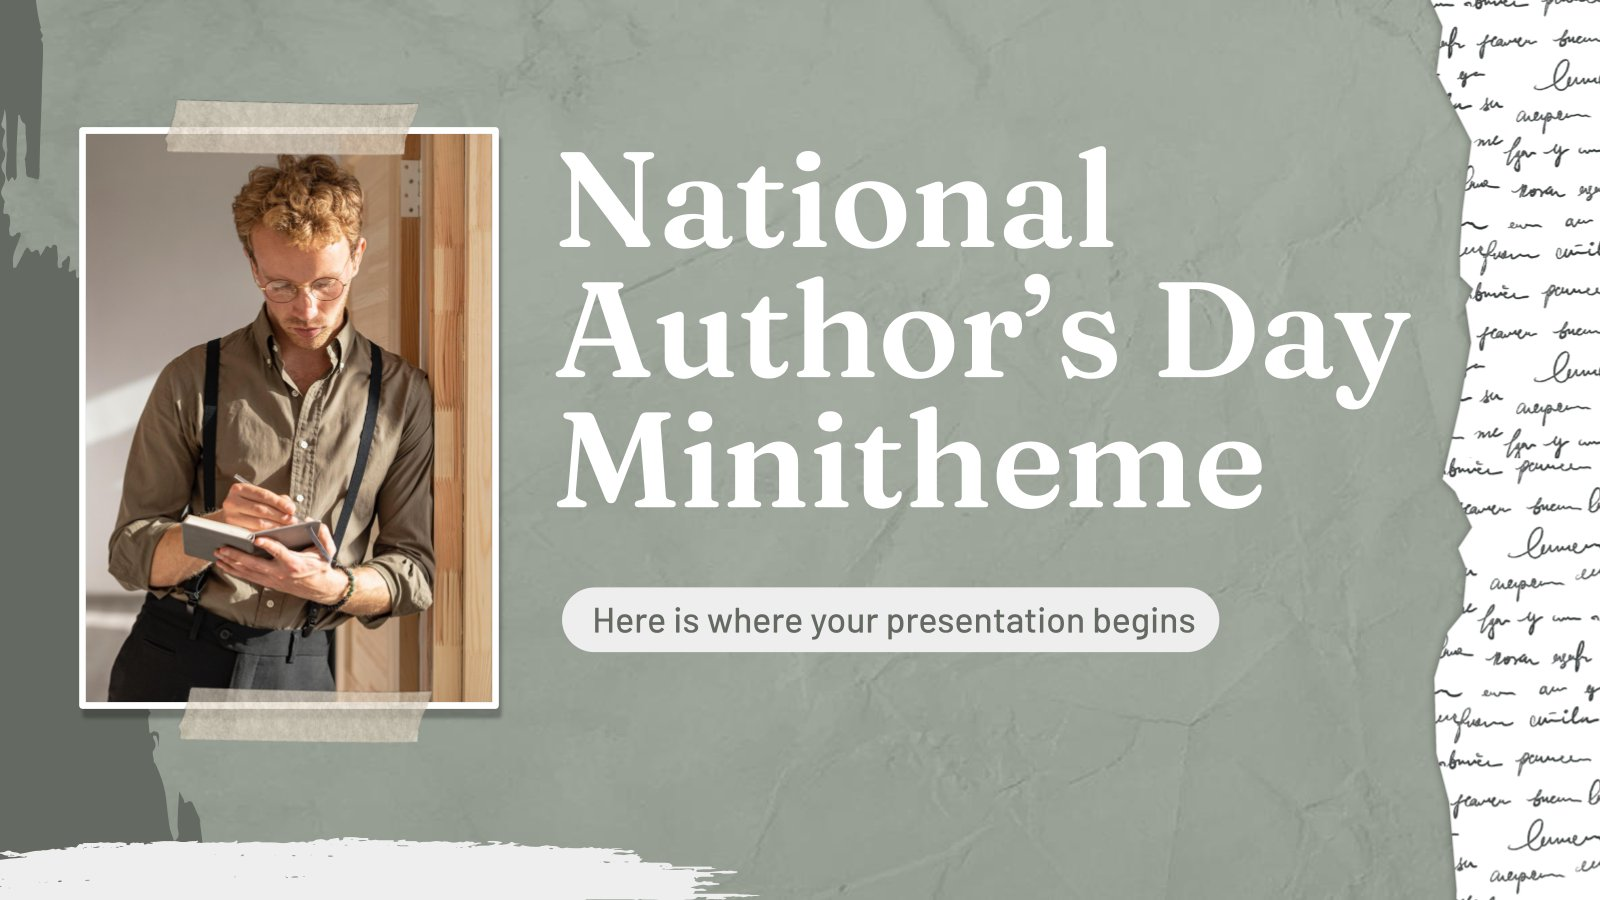 National Author's Day Minitheme presentation template